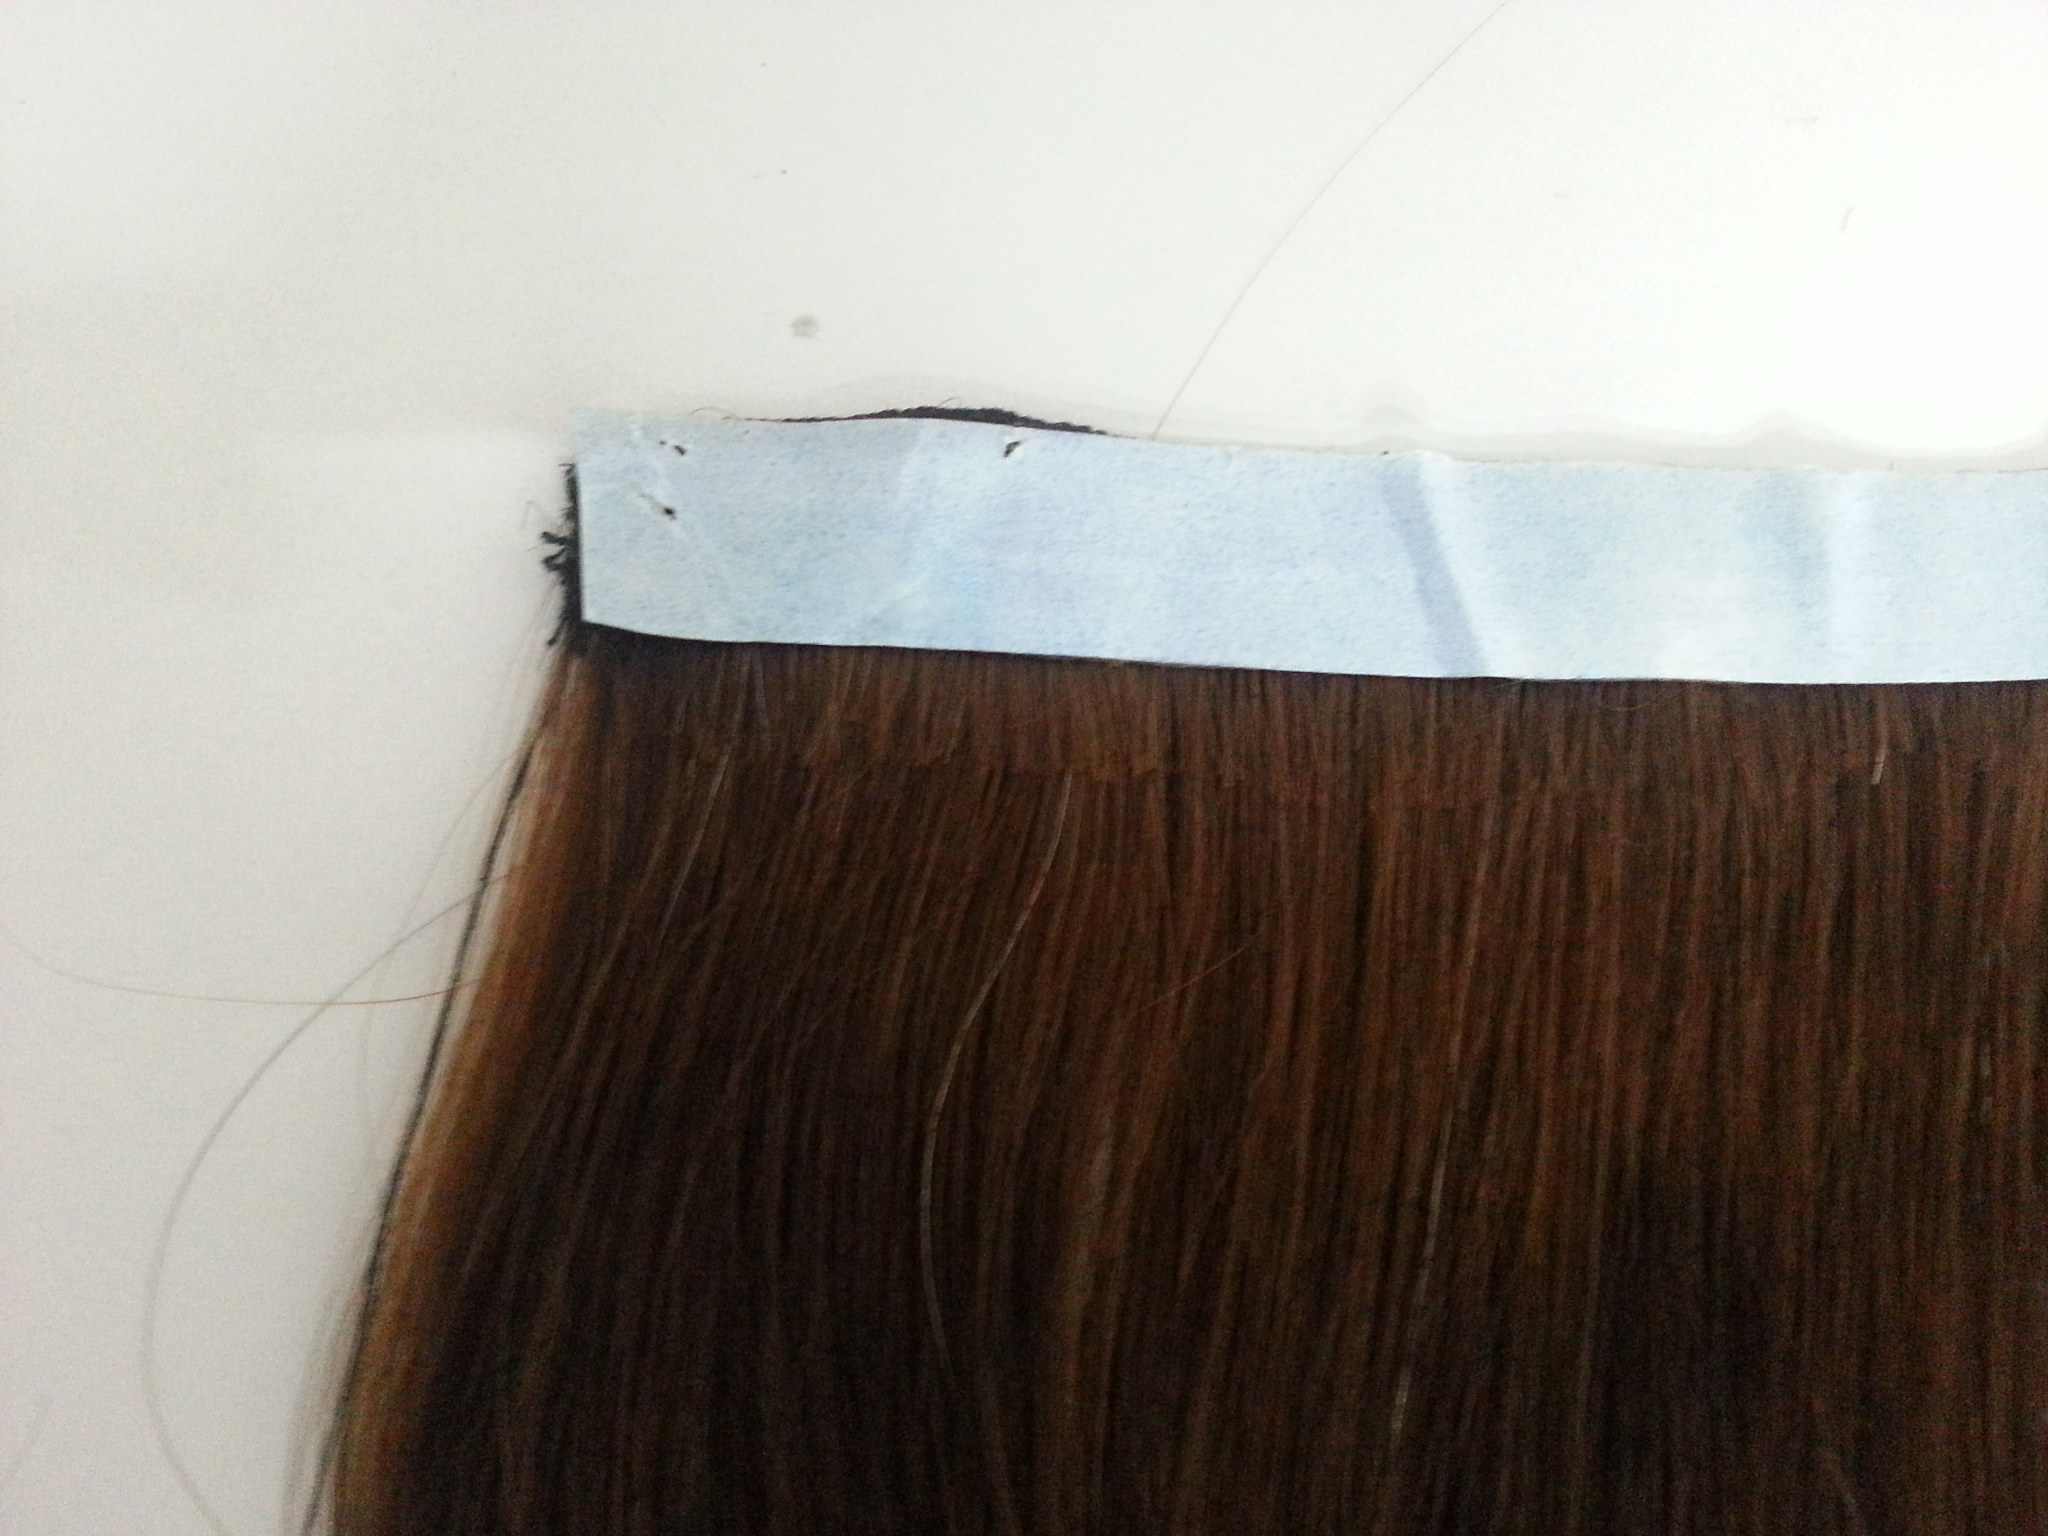 Fita adesiva azul dupla face Lace Front transparente 33m